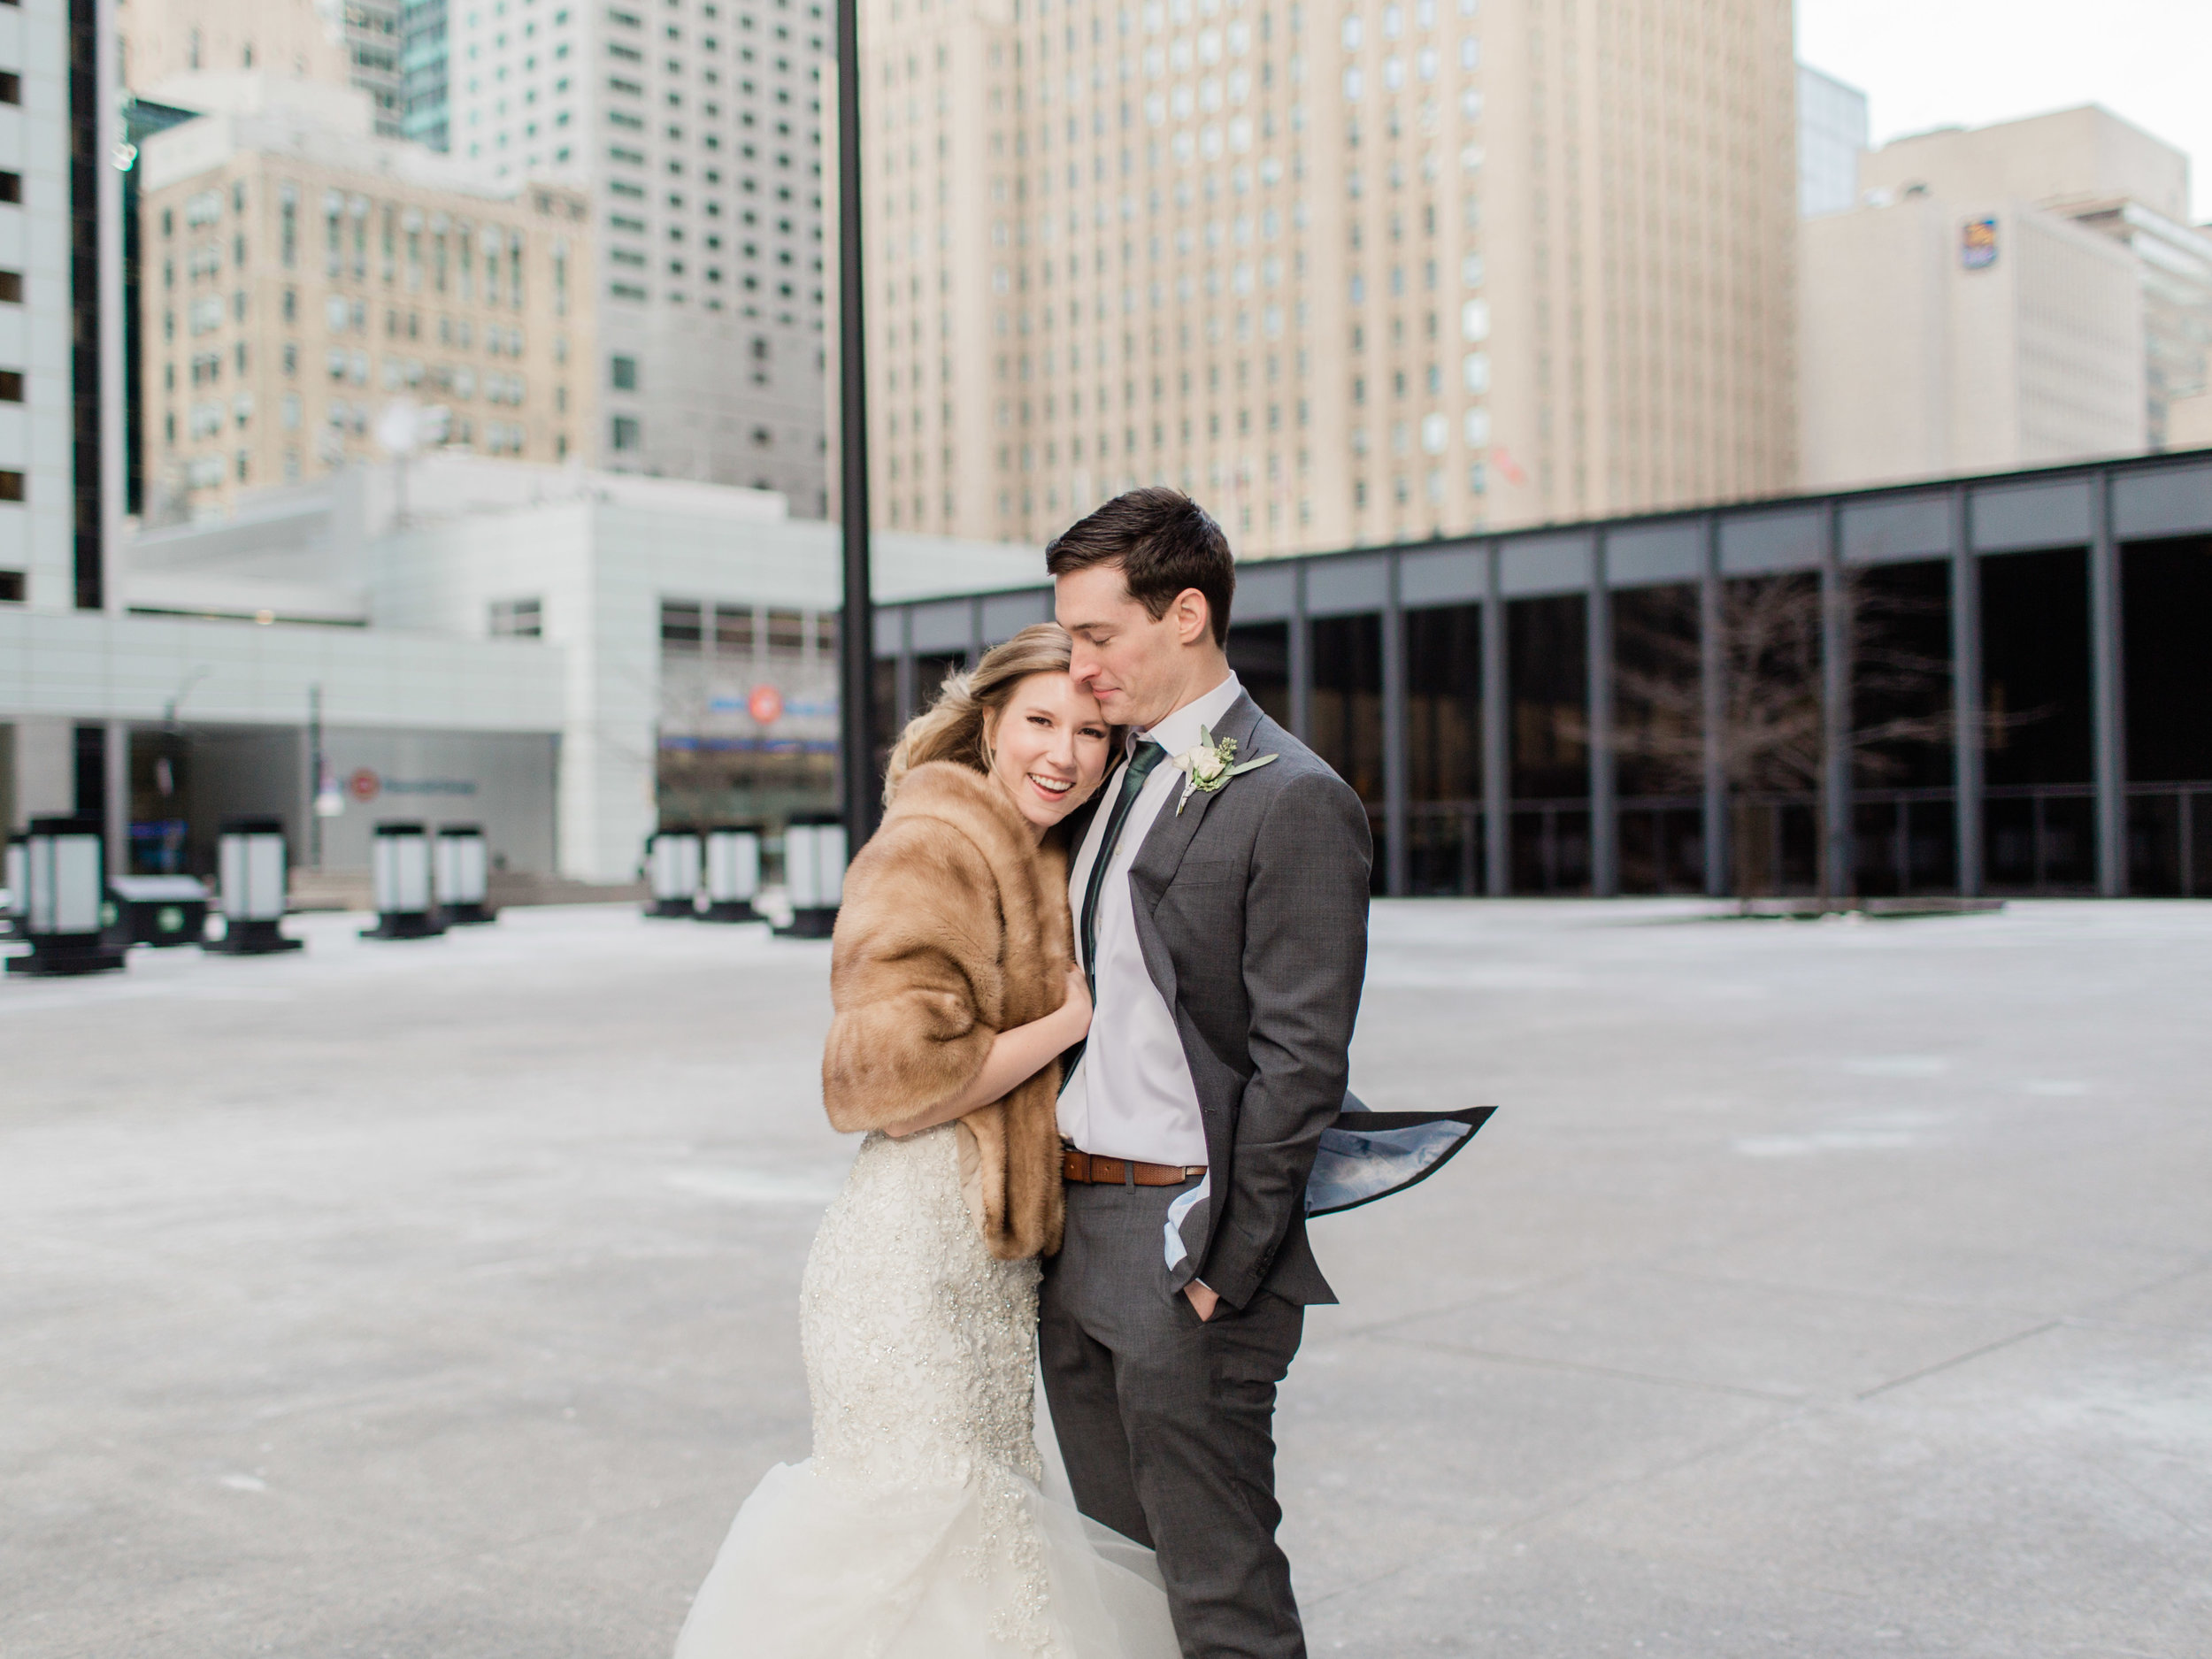 Toronto-Collingwood-Muskoka-Wedding-photographer-how-to-capture-great-couples-photos-on-your-wedding-day5.jpg